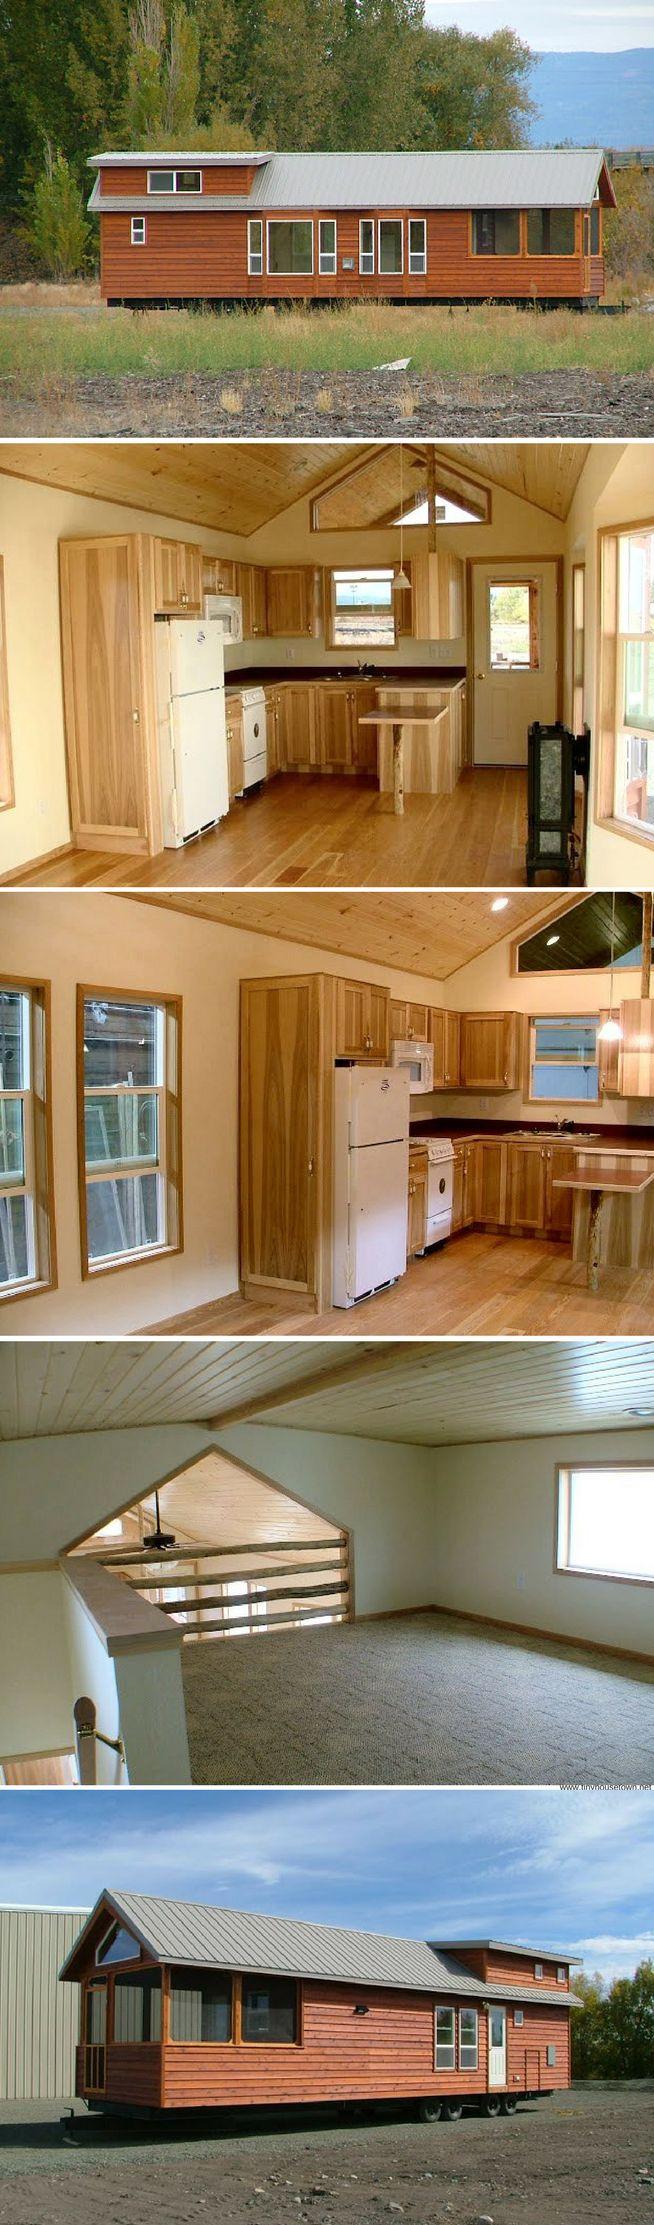 The Watson: a beautiful park model cabin